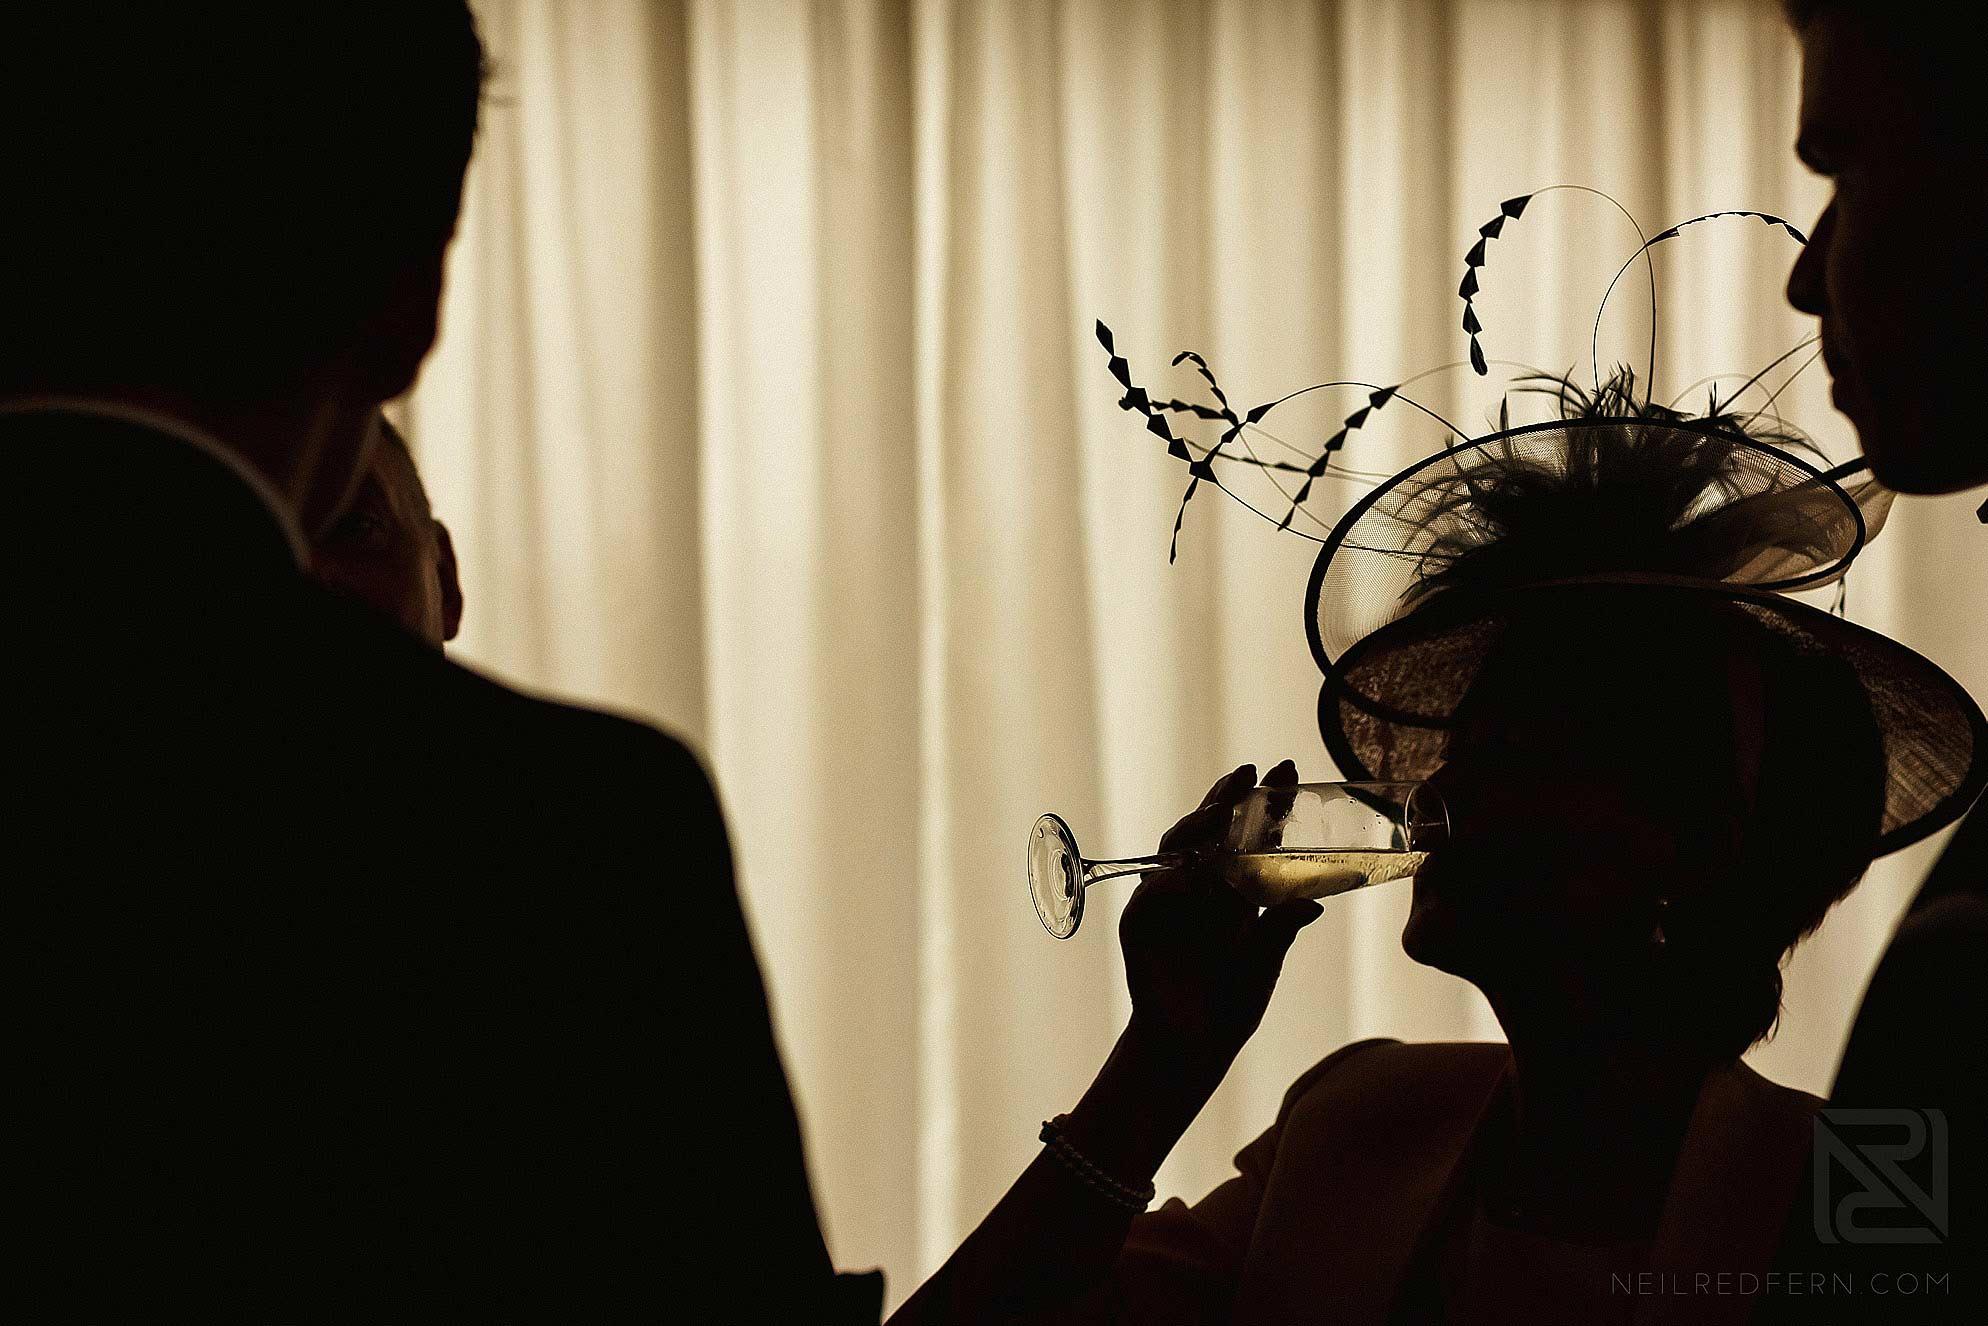 colshaw-hall-wedding-photographs-19